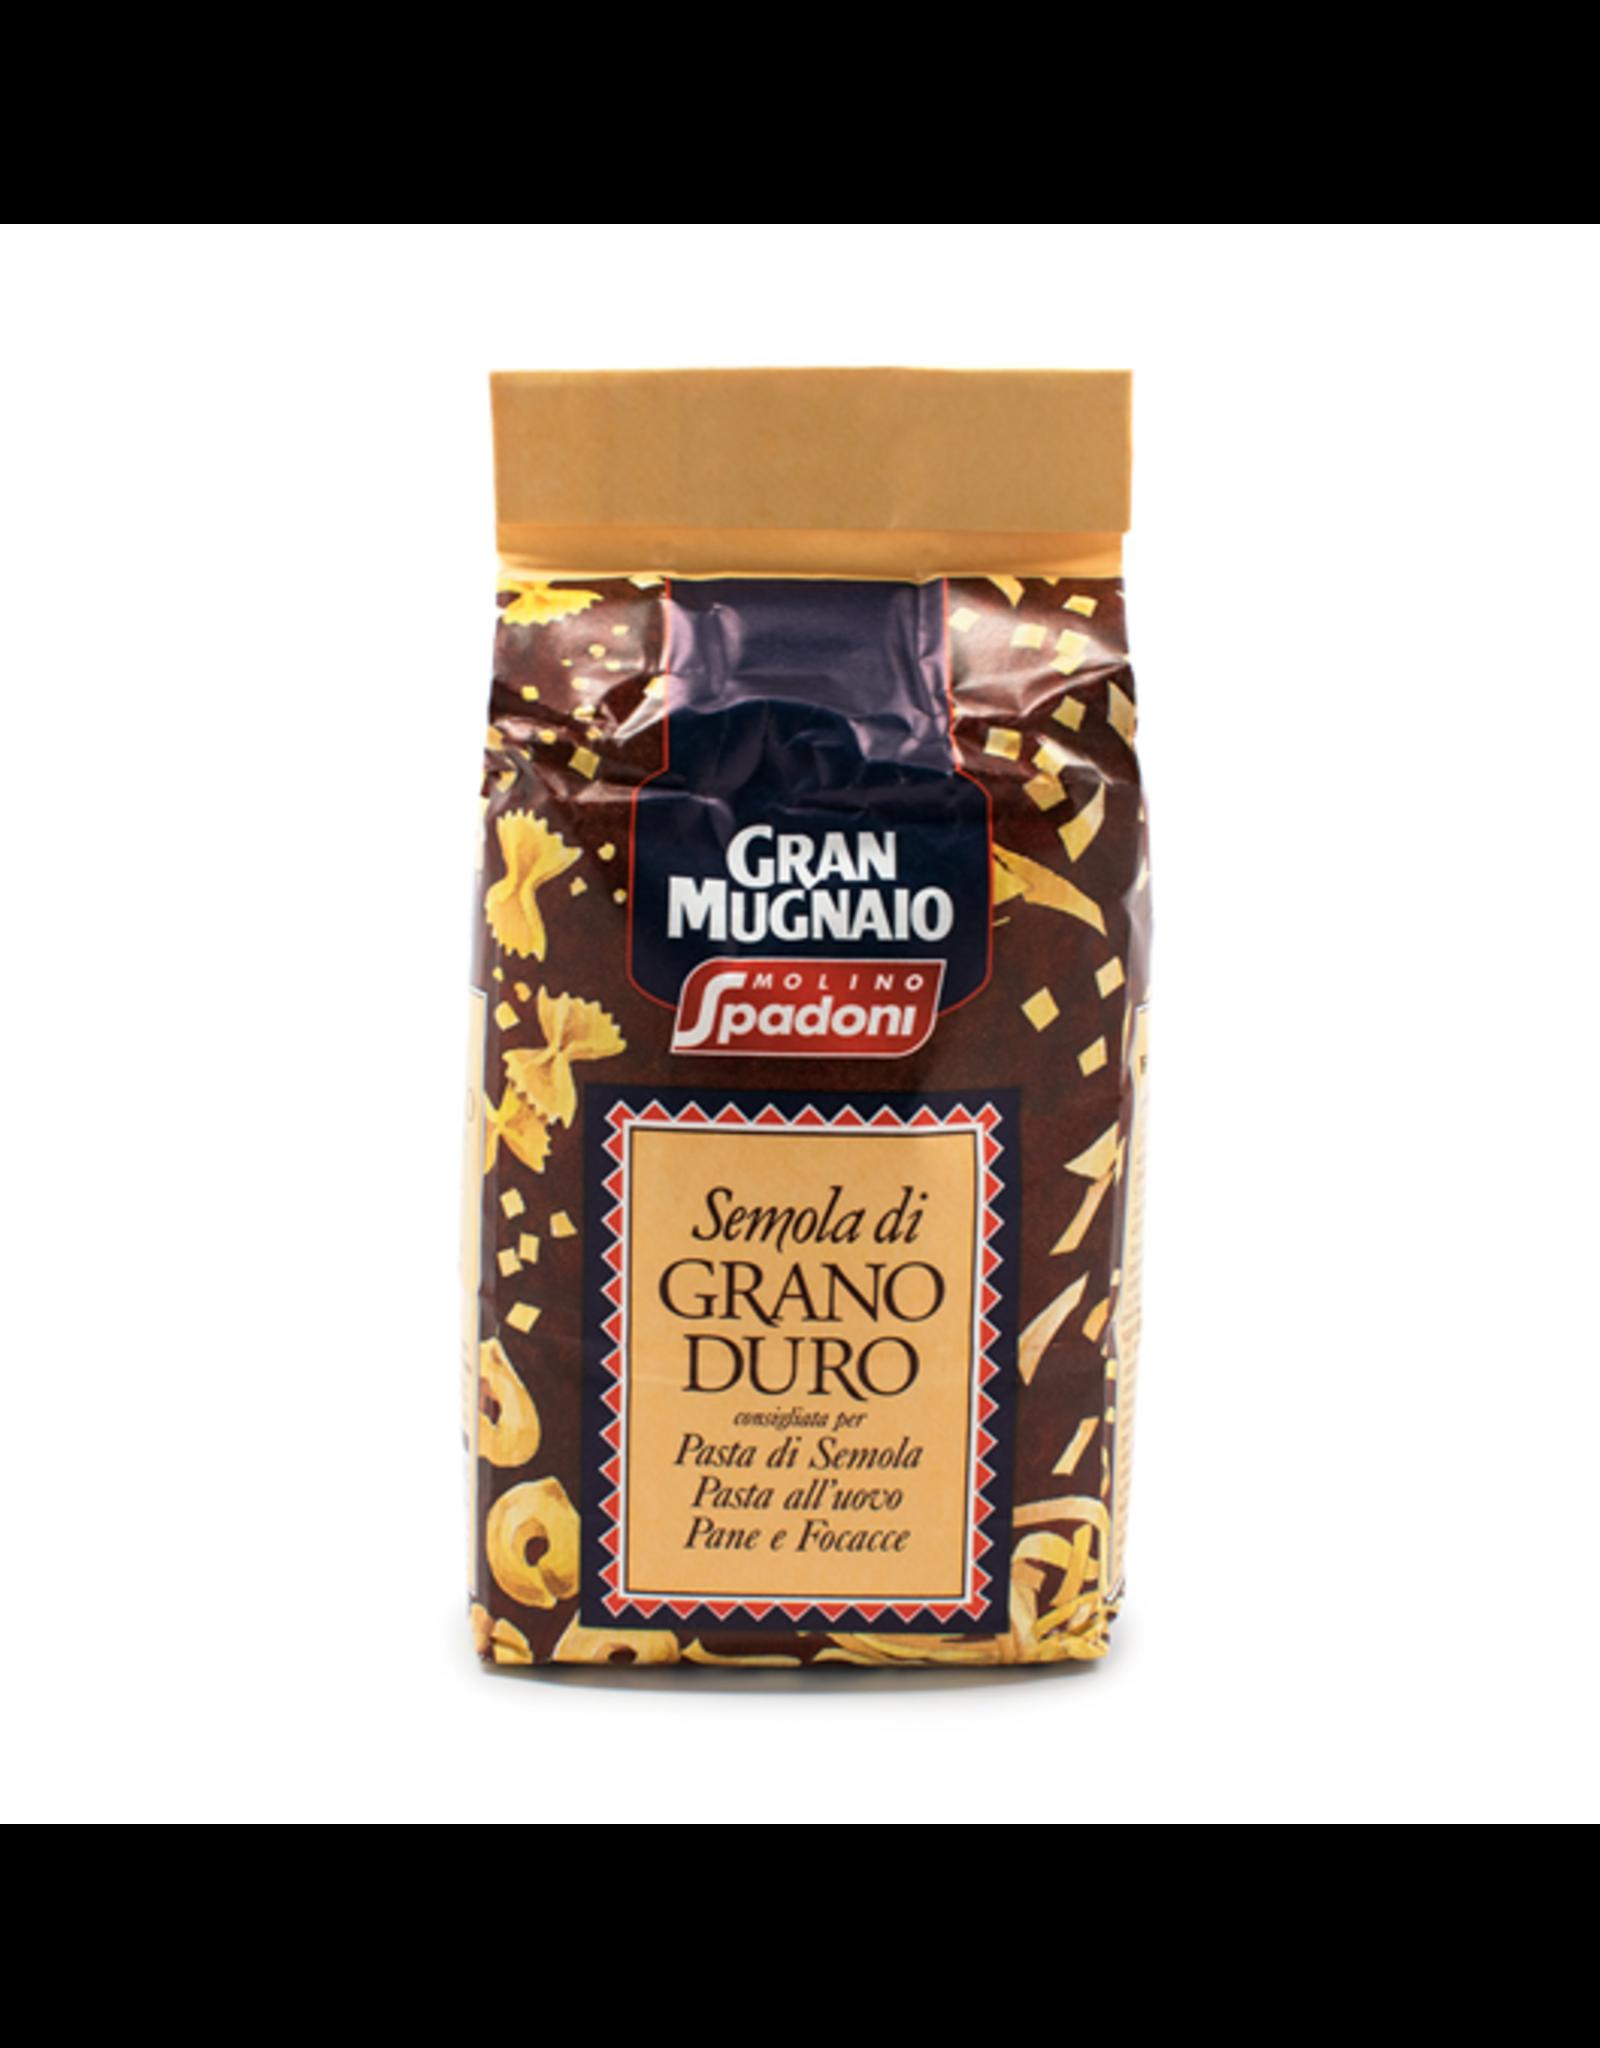 Gran Mugnaio Grano Duro  Durum Wheat Semolina